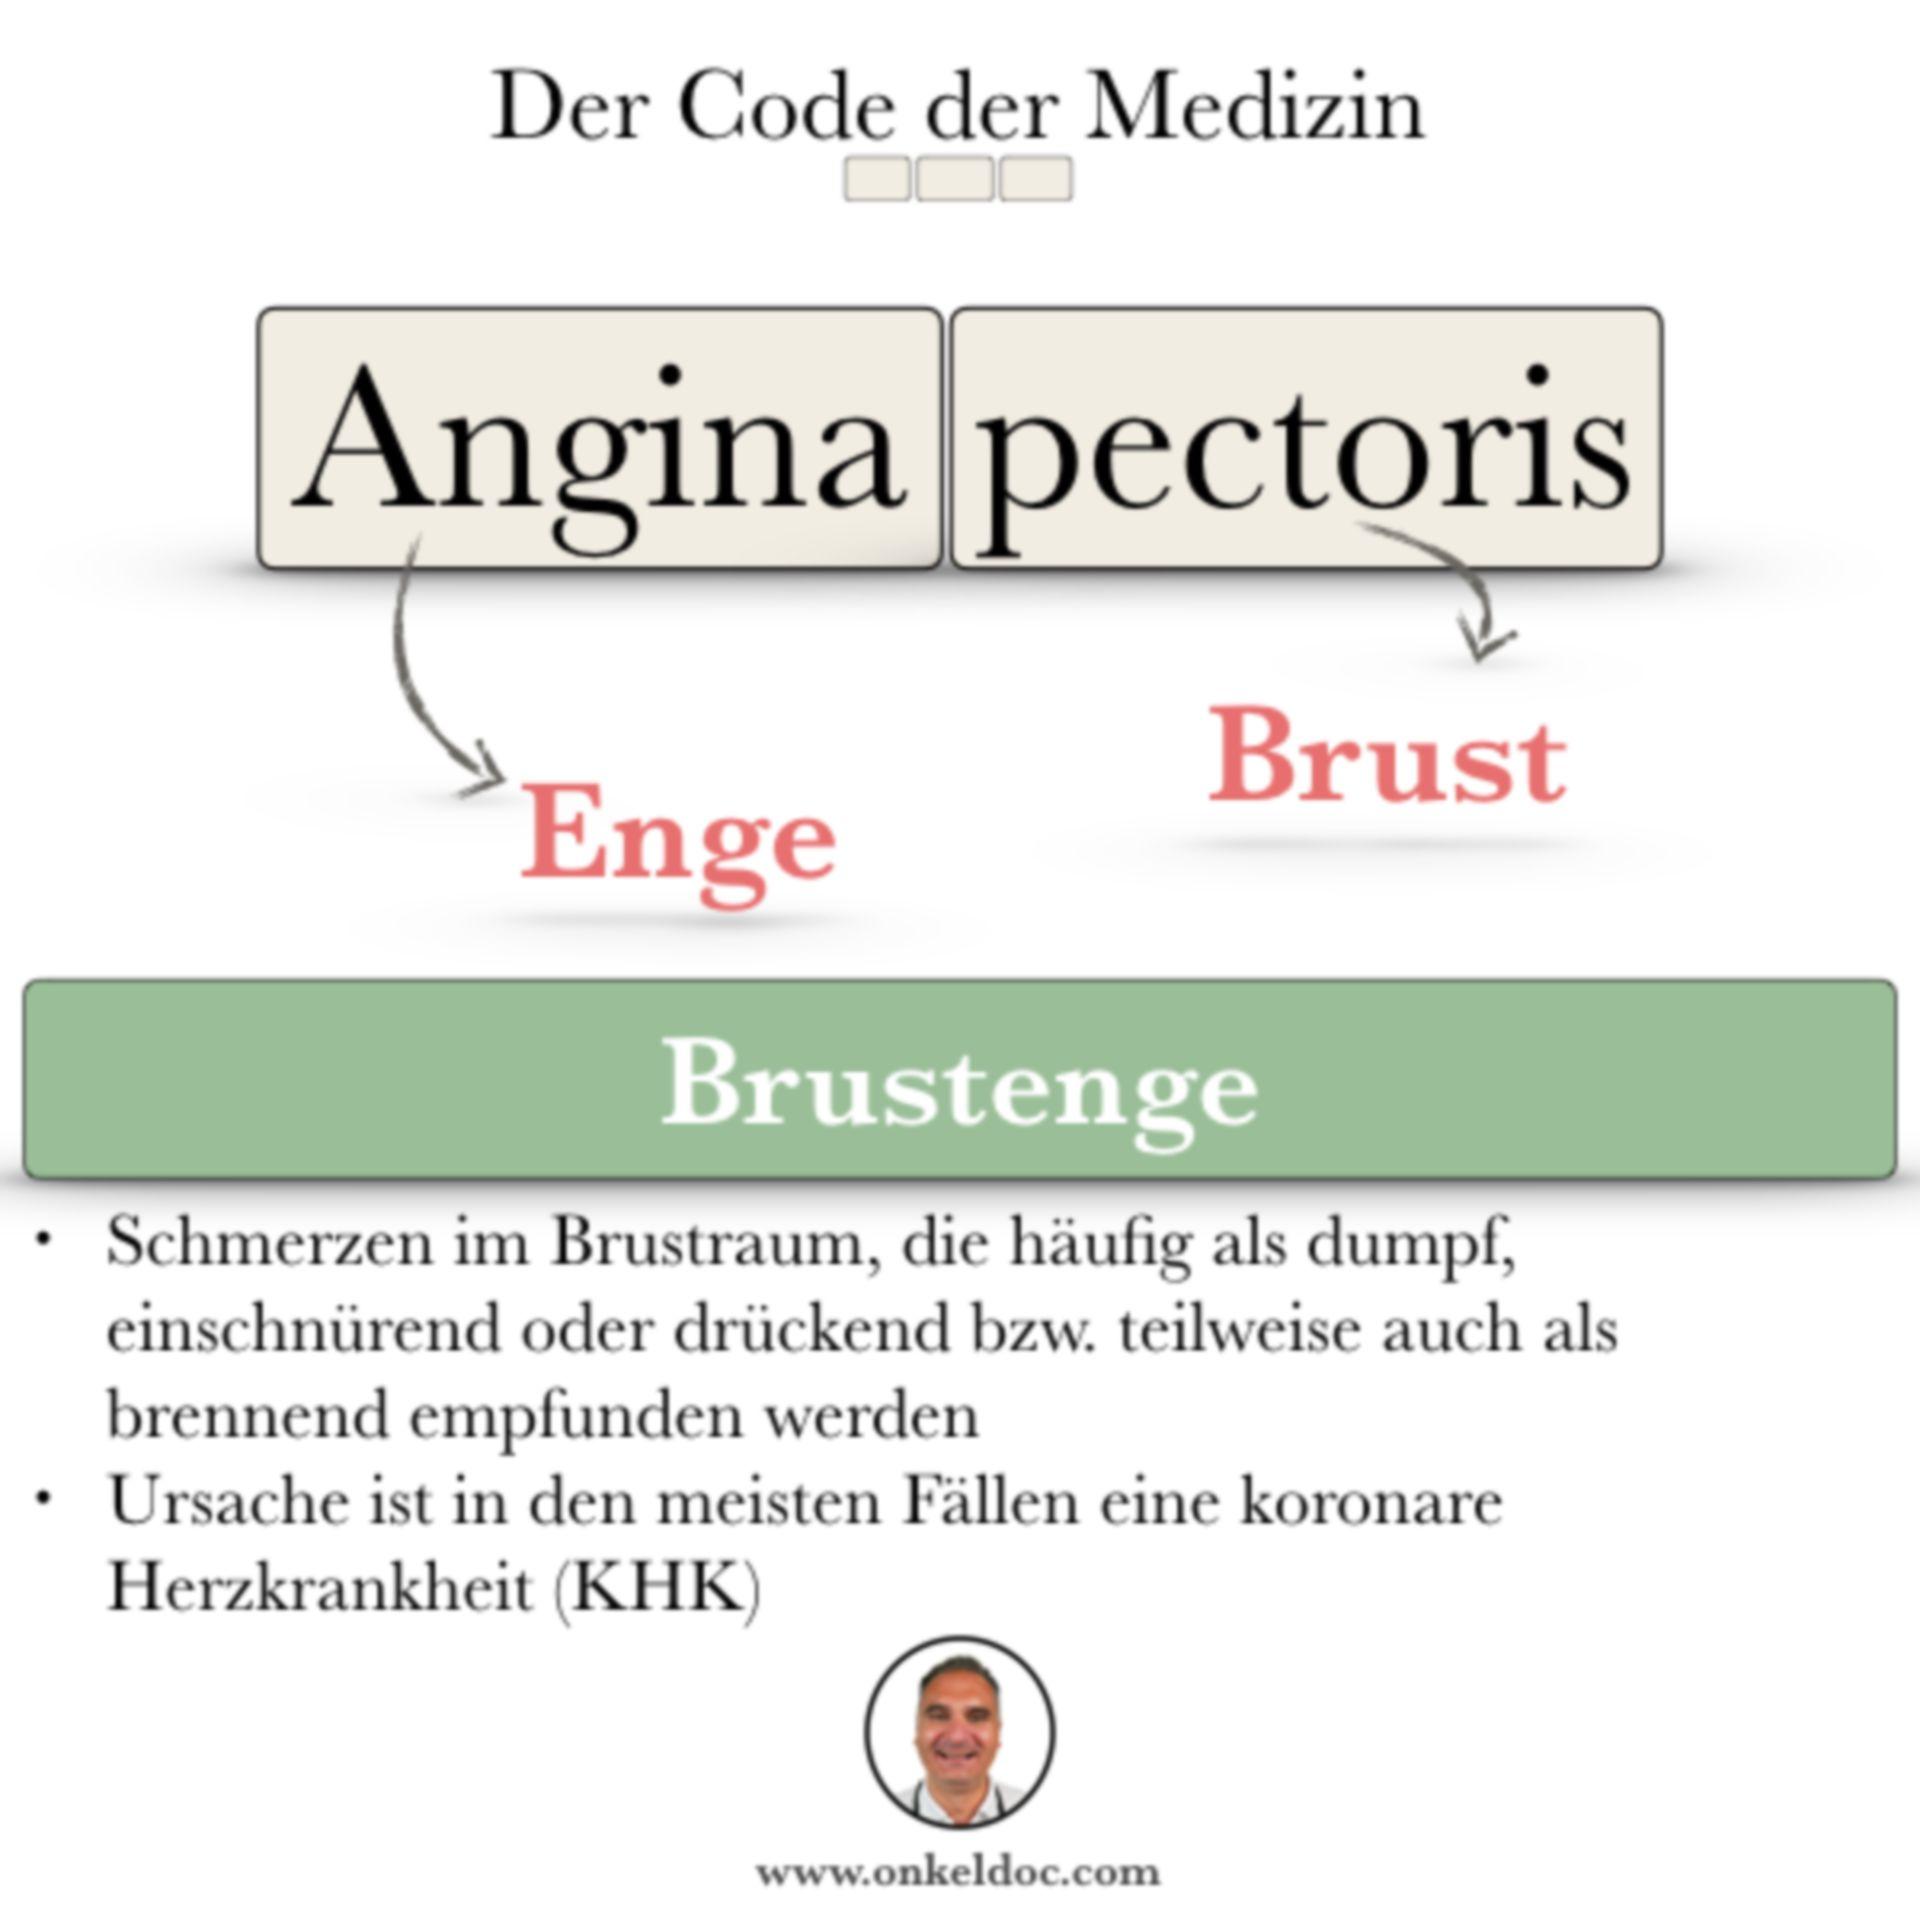 Der Code der Angina pectoris